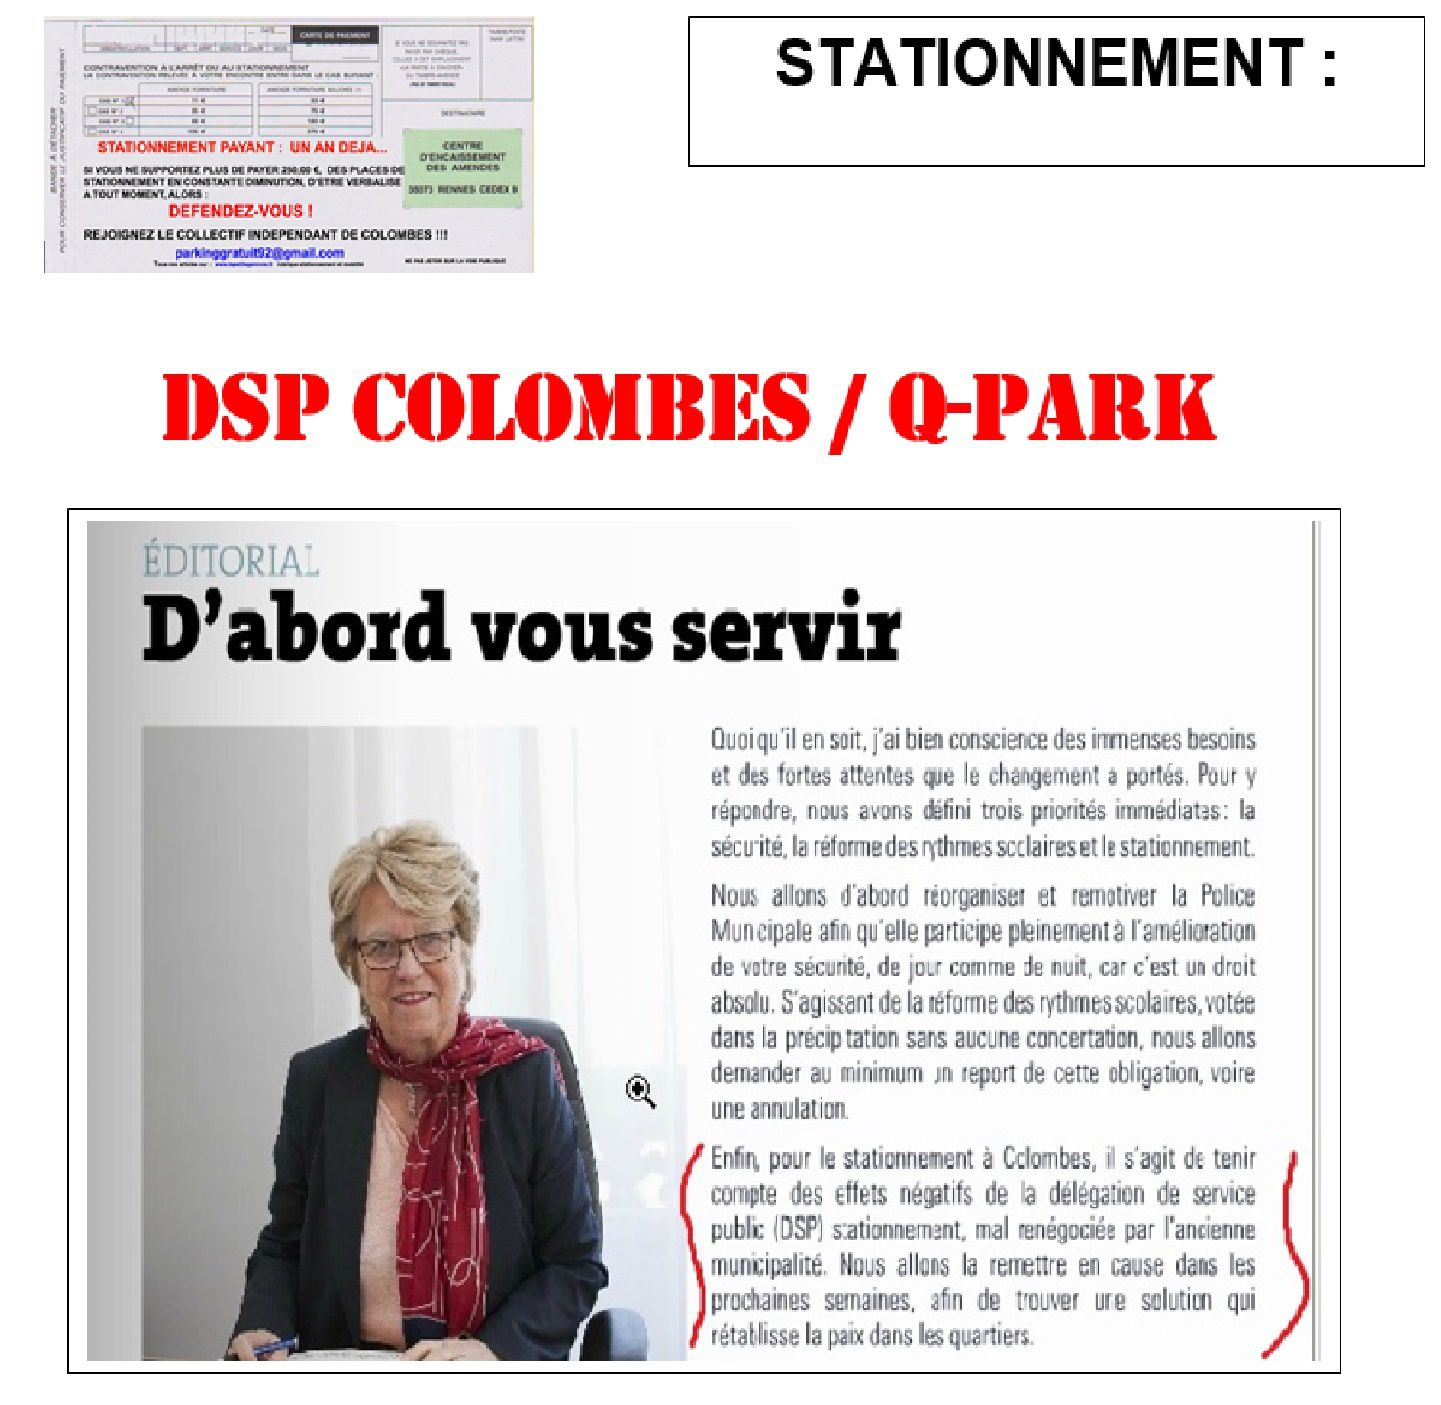 COLOMBES : DSP QPARK RENIEMENT !  CAPITULATION !  RENONCEMENT !